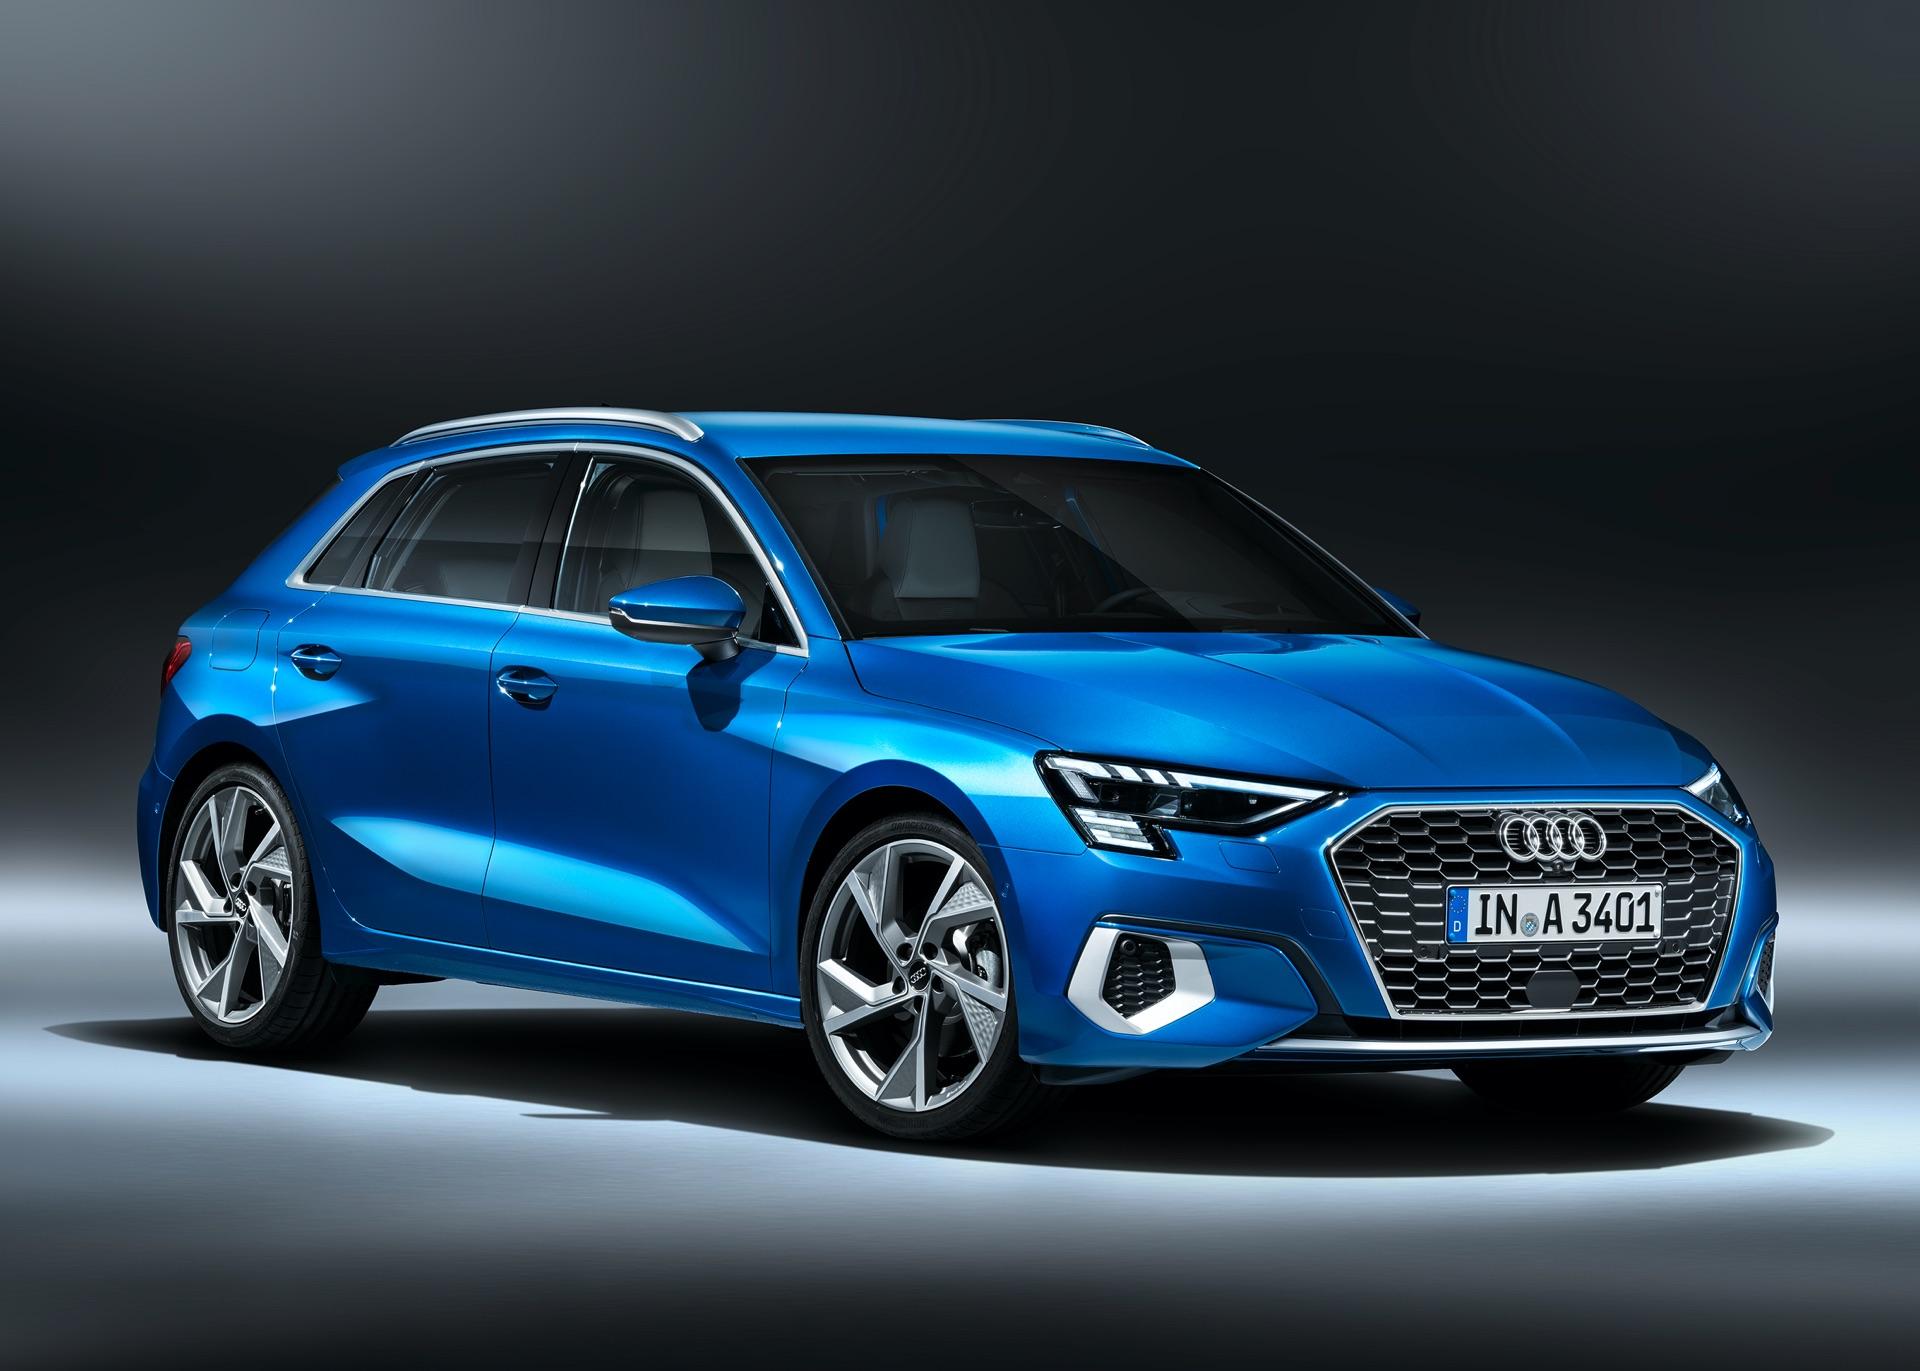 Kelebihan Kekurangan Audi M3 Murah Berkualitas